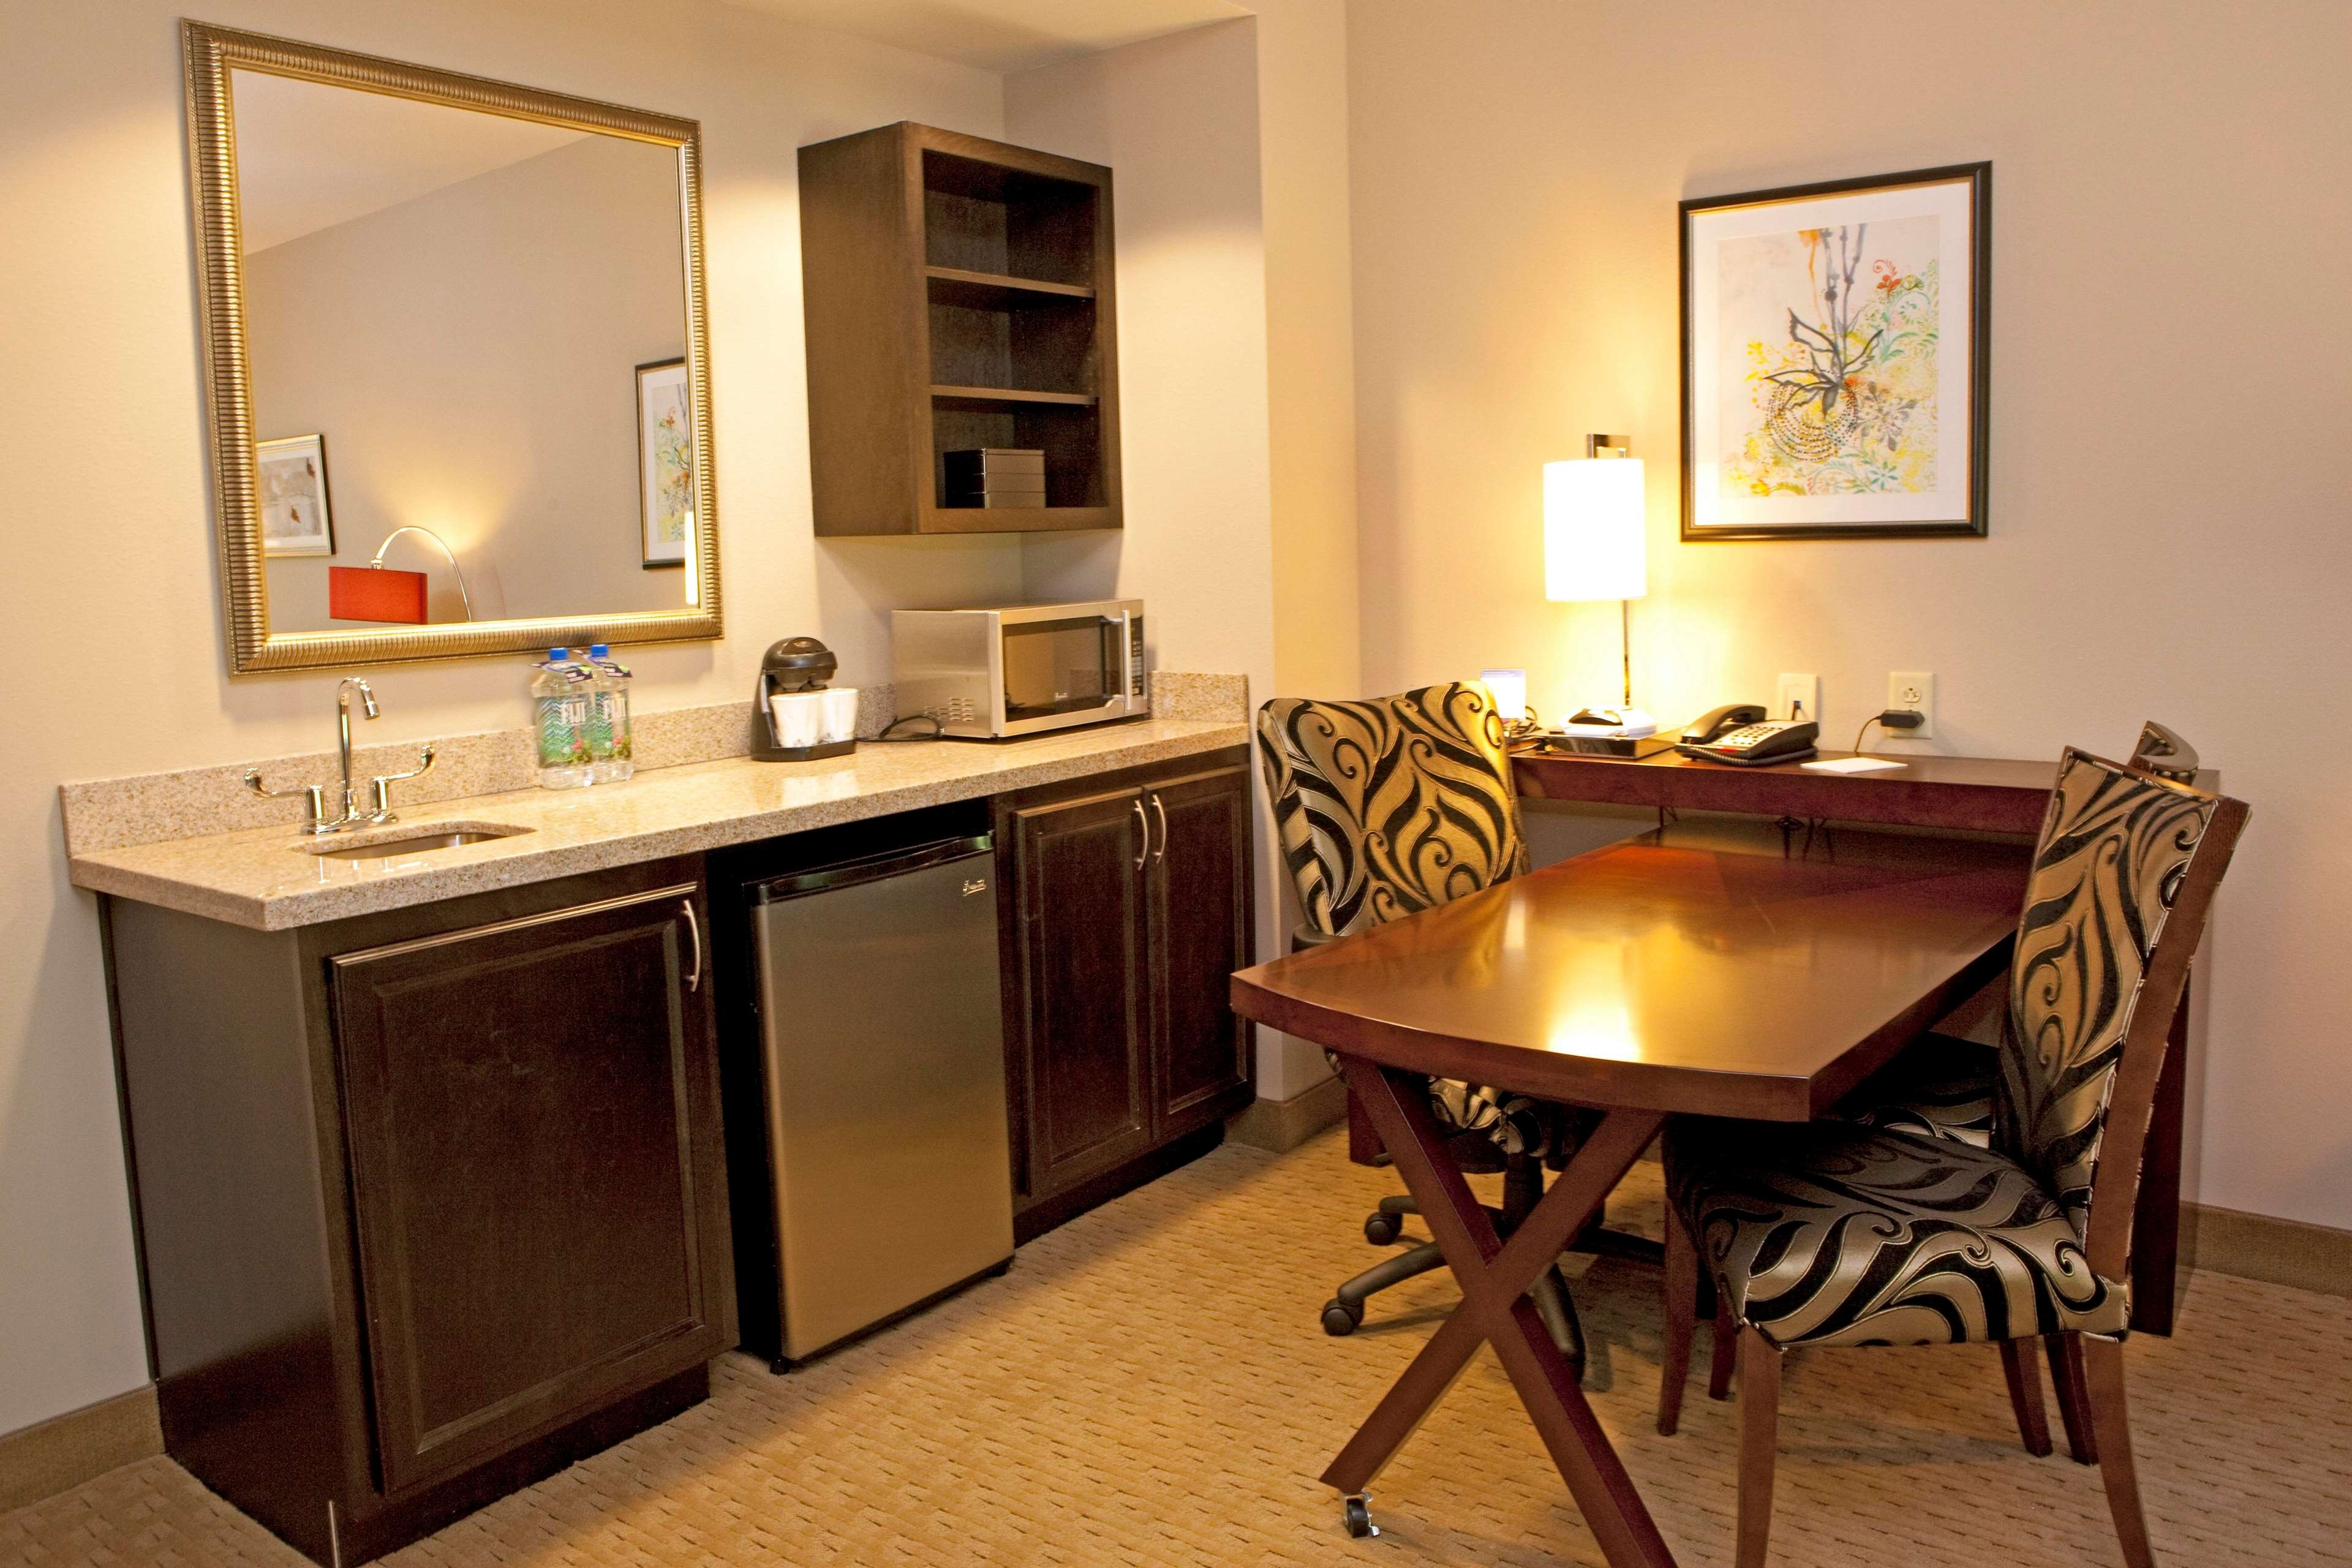 Embassy Suites by Hilton Birmingham Hoover image 43